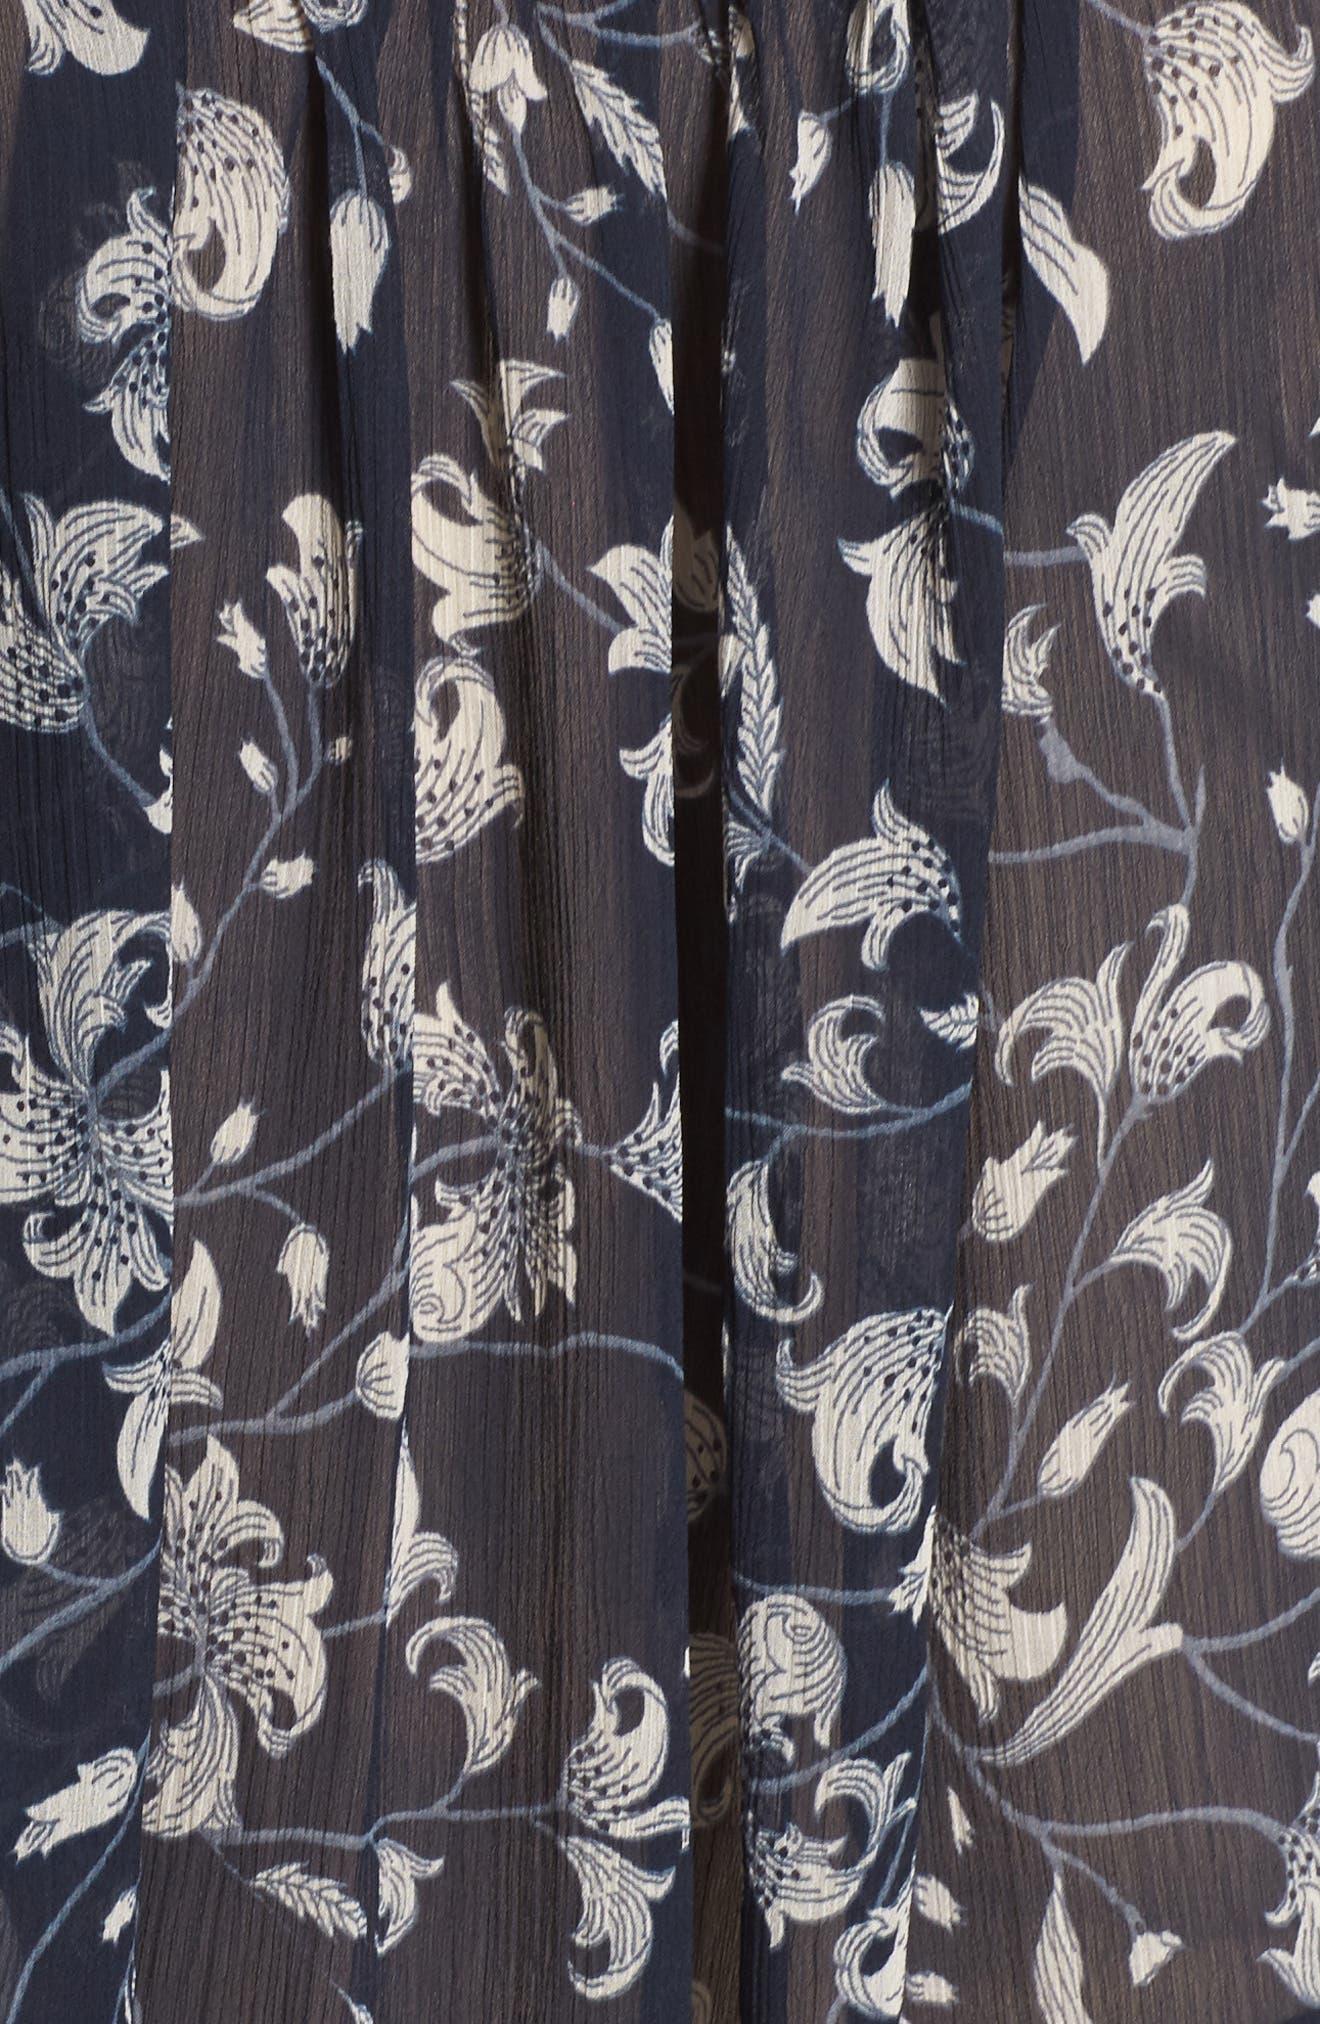 Floral Print Ruffle Top,                             Alternate thumbnail 5, color,                             460